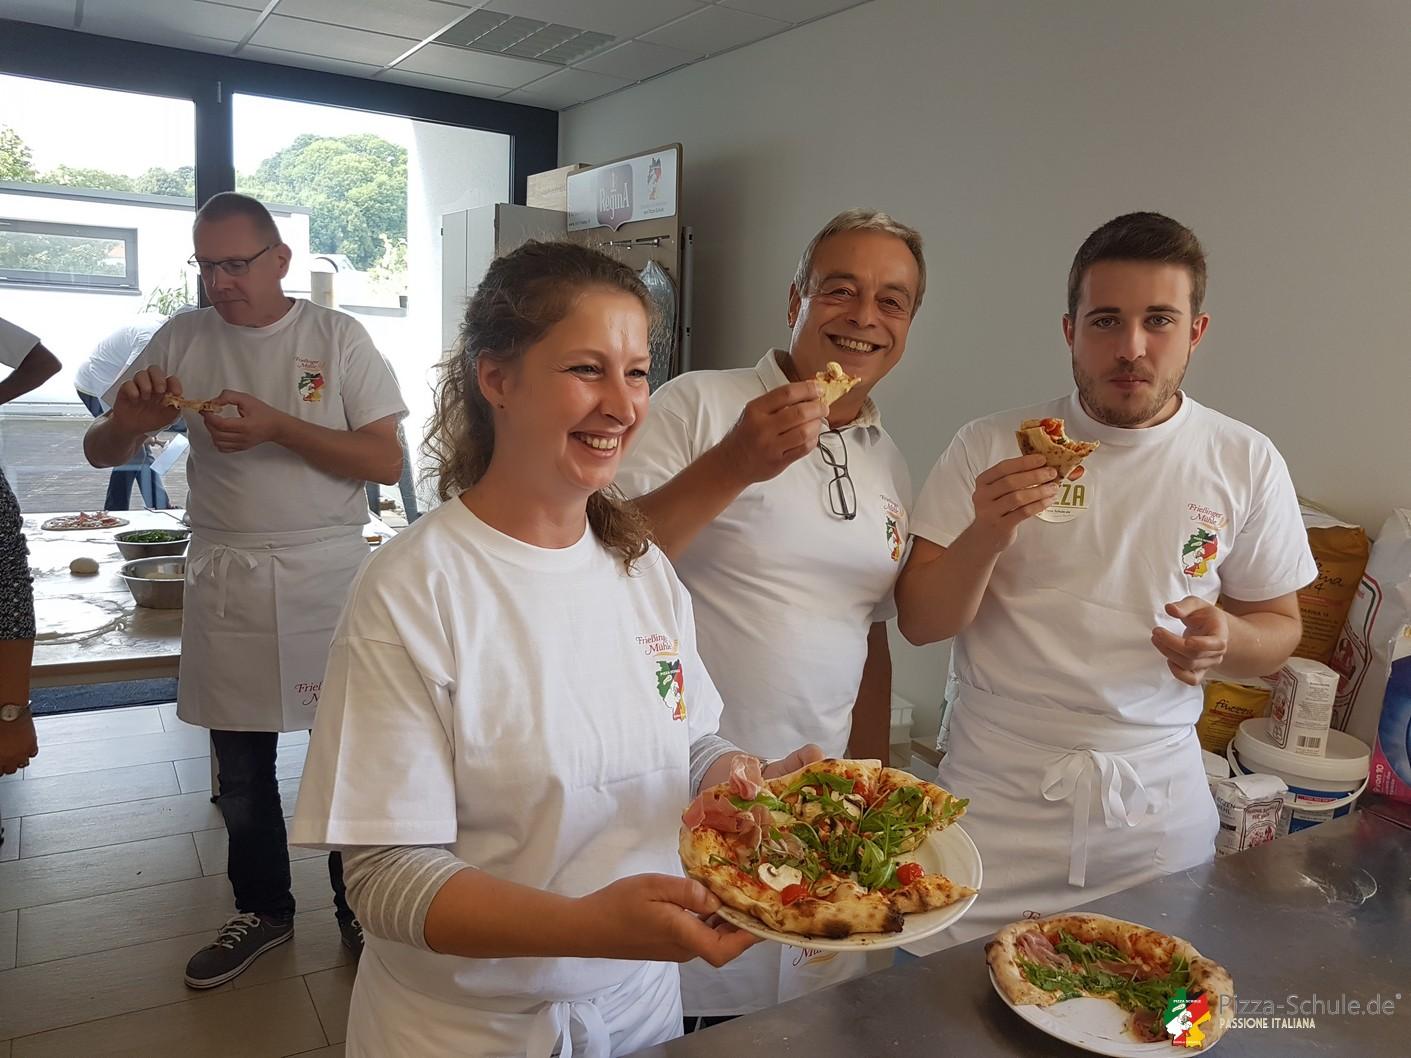 Pizza-Seminar Frießinger bei Pizza-Schule.de